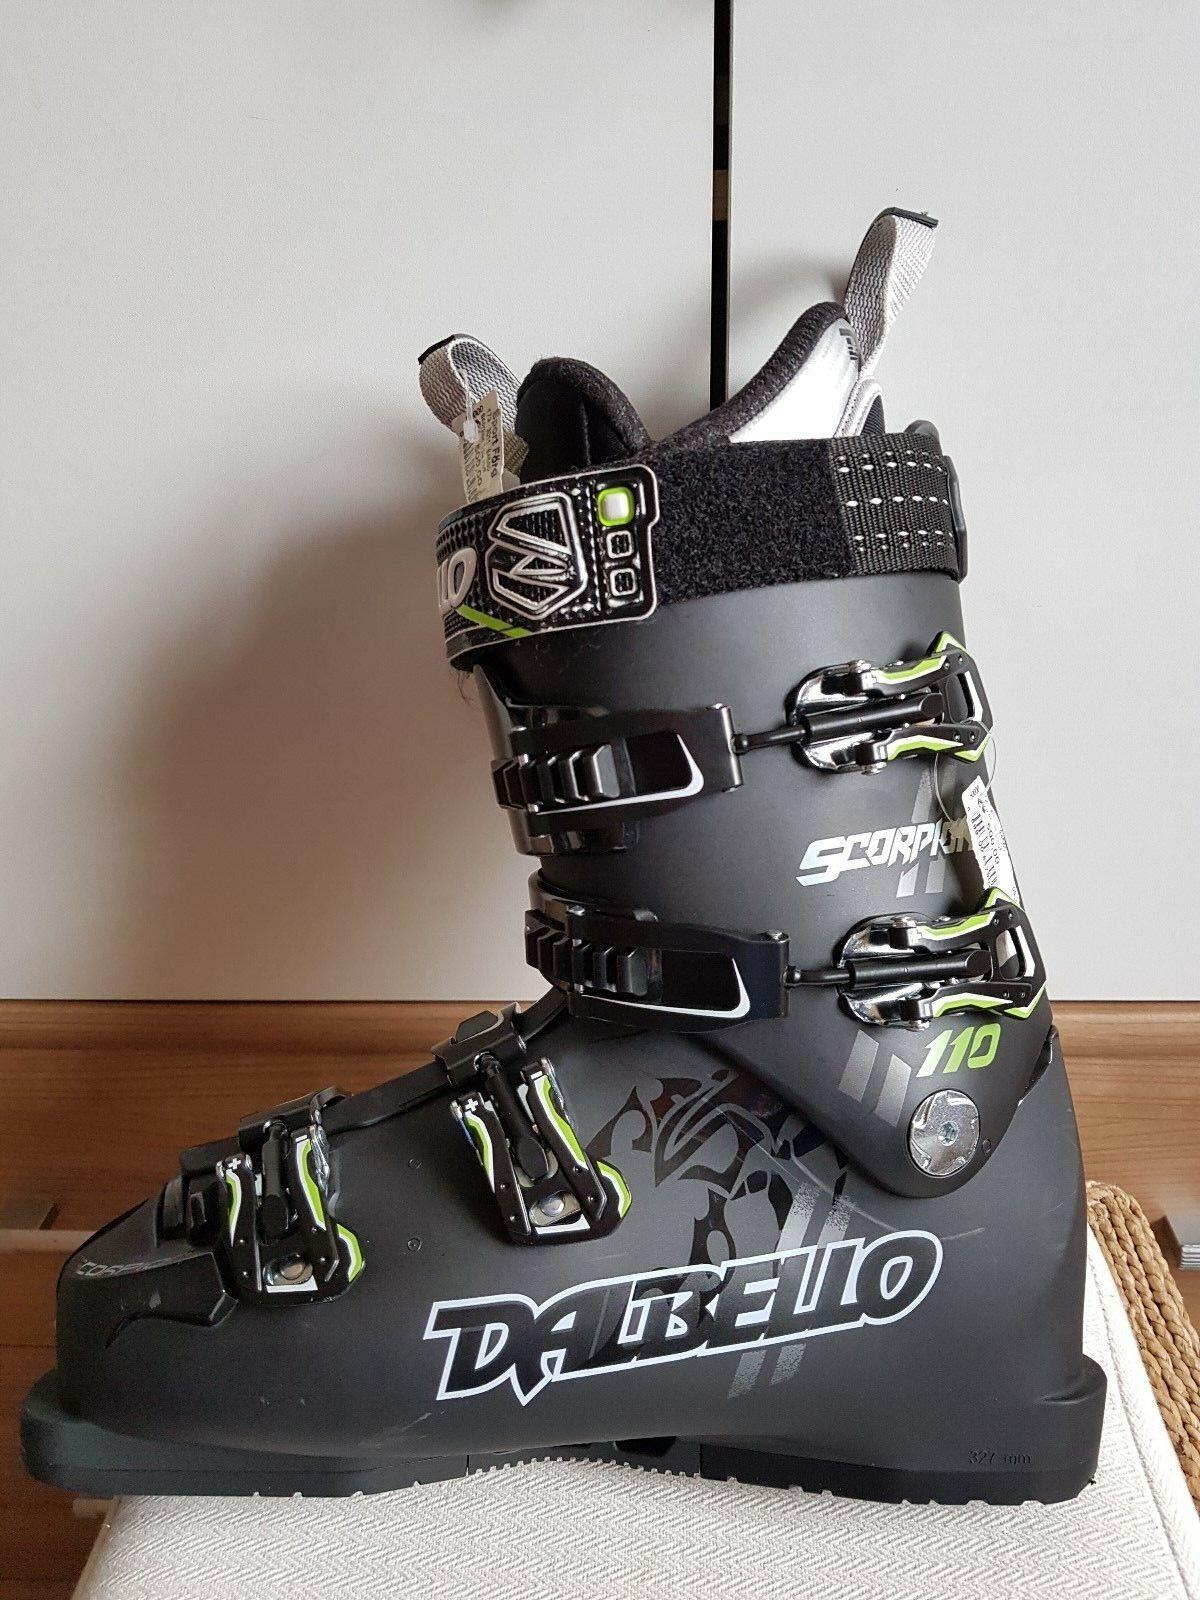 Dalbello Scorpion 110 SkiStiefel Neu, Gr.36,5, Skischuhe, 282 282 282 mm, UK 4,5 89f587